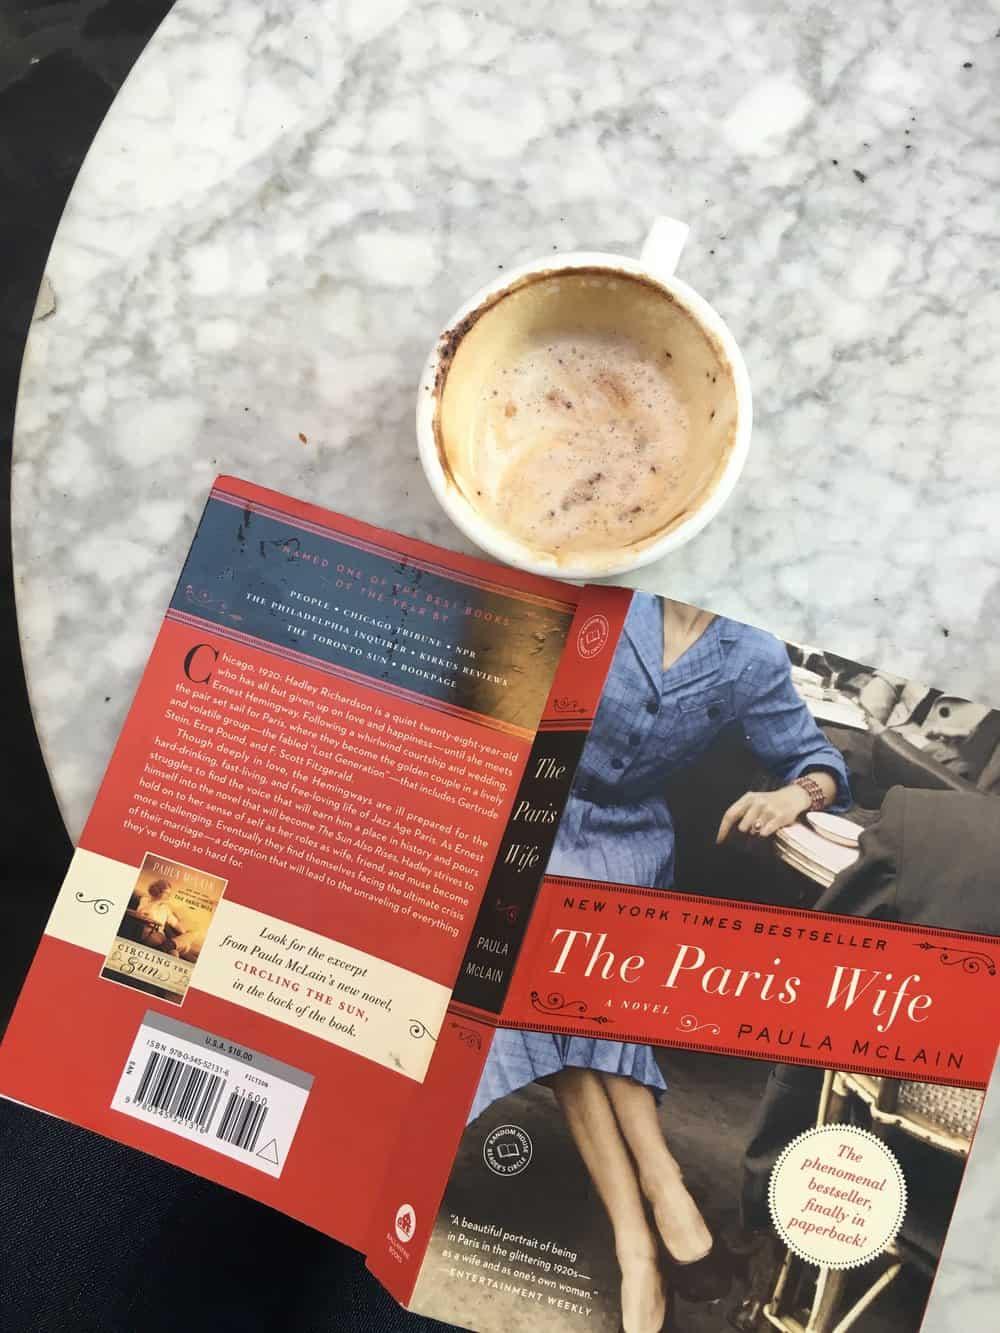 the paris wife by paula mclain for every day parisian book club